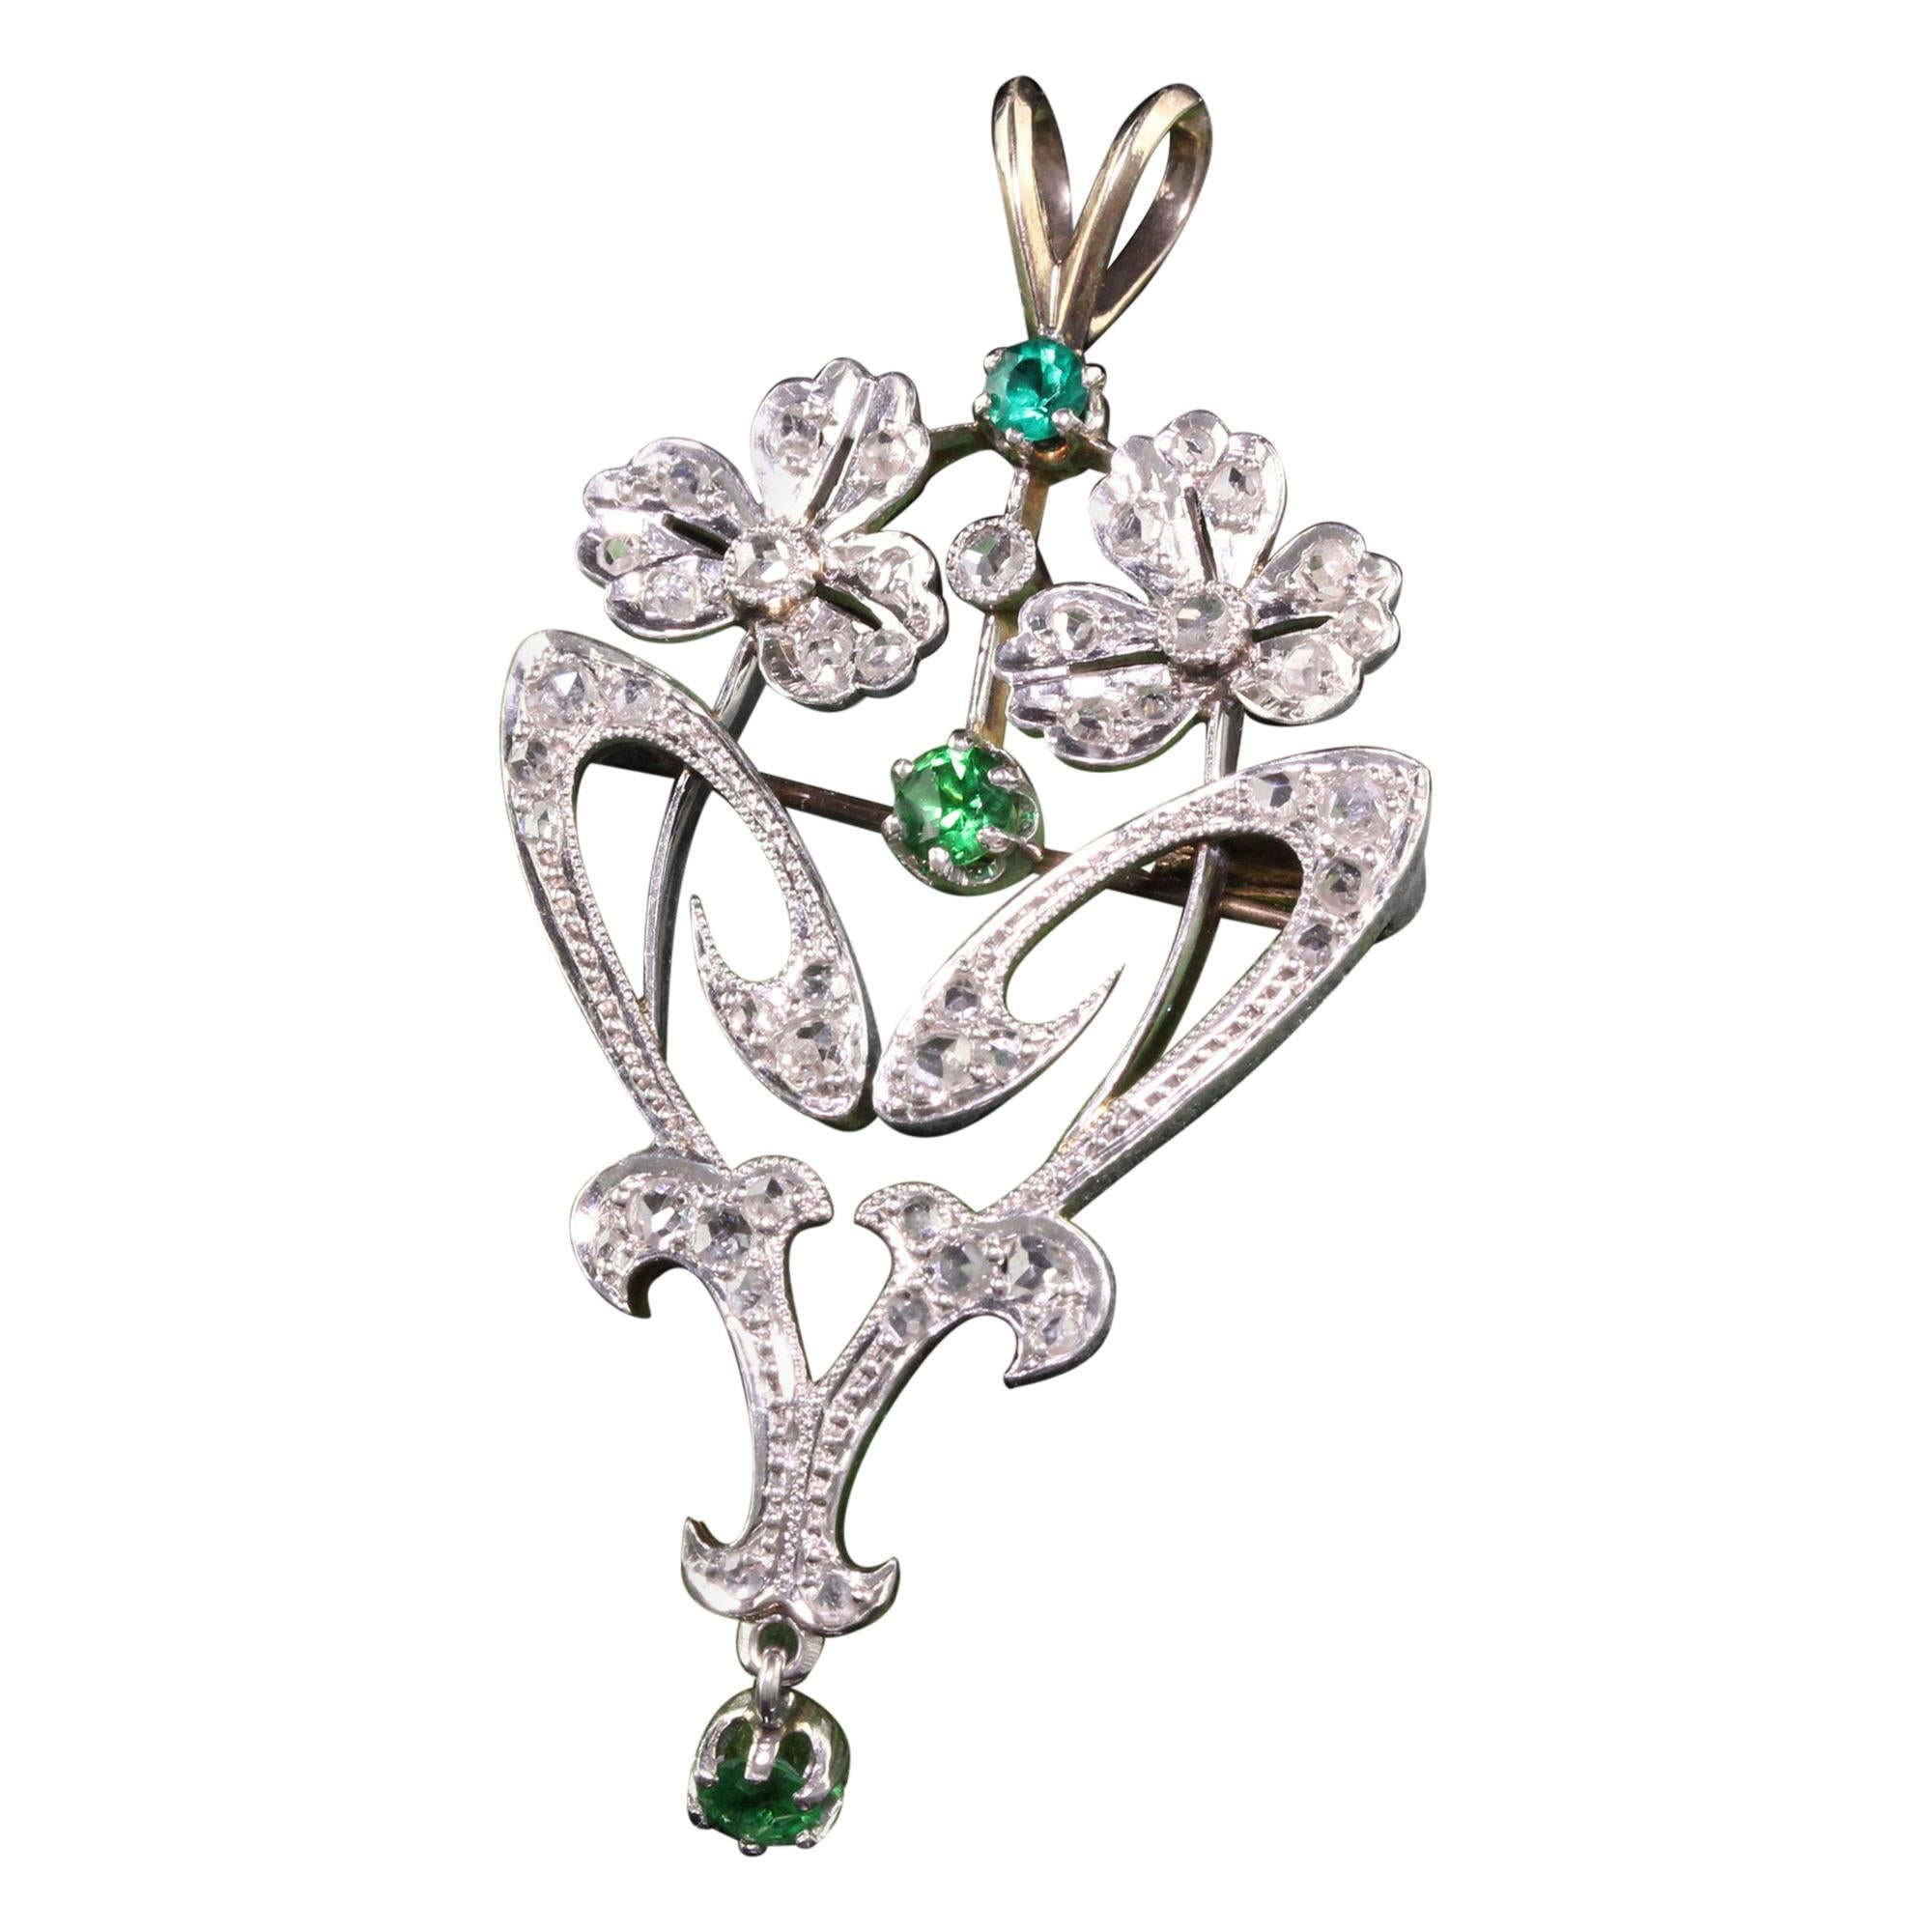 Antique Art Deco French 18K Platinum Diamond and Emerald Flower Pin Pendant